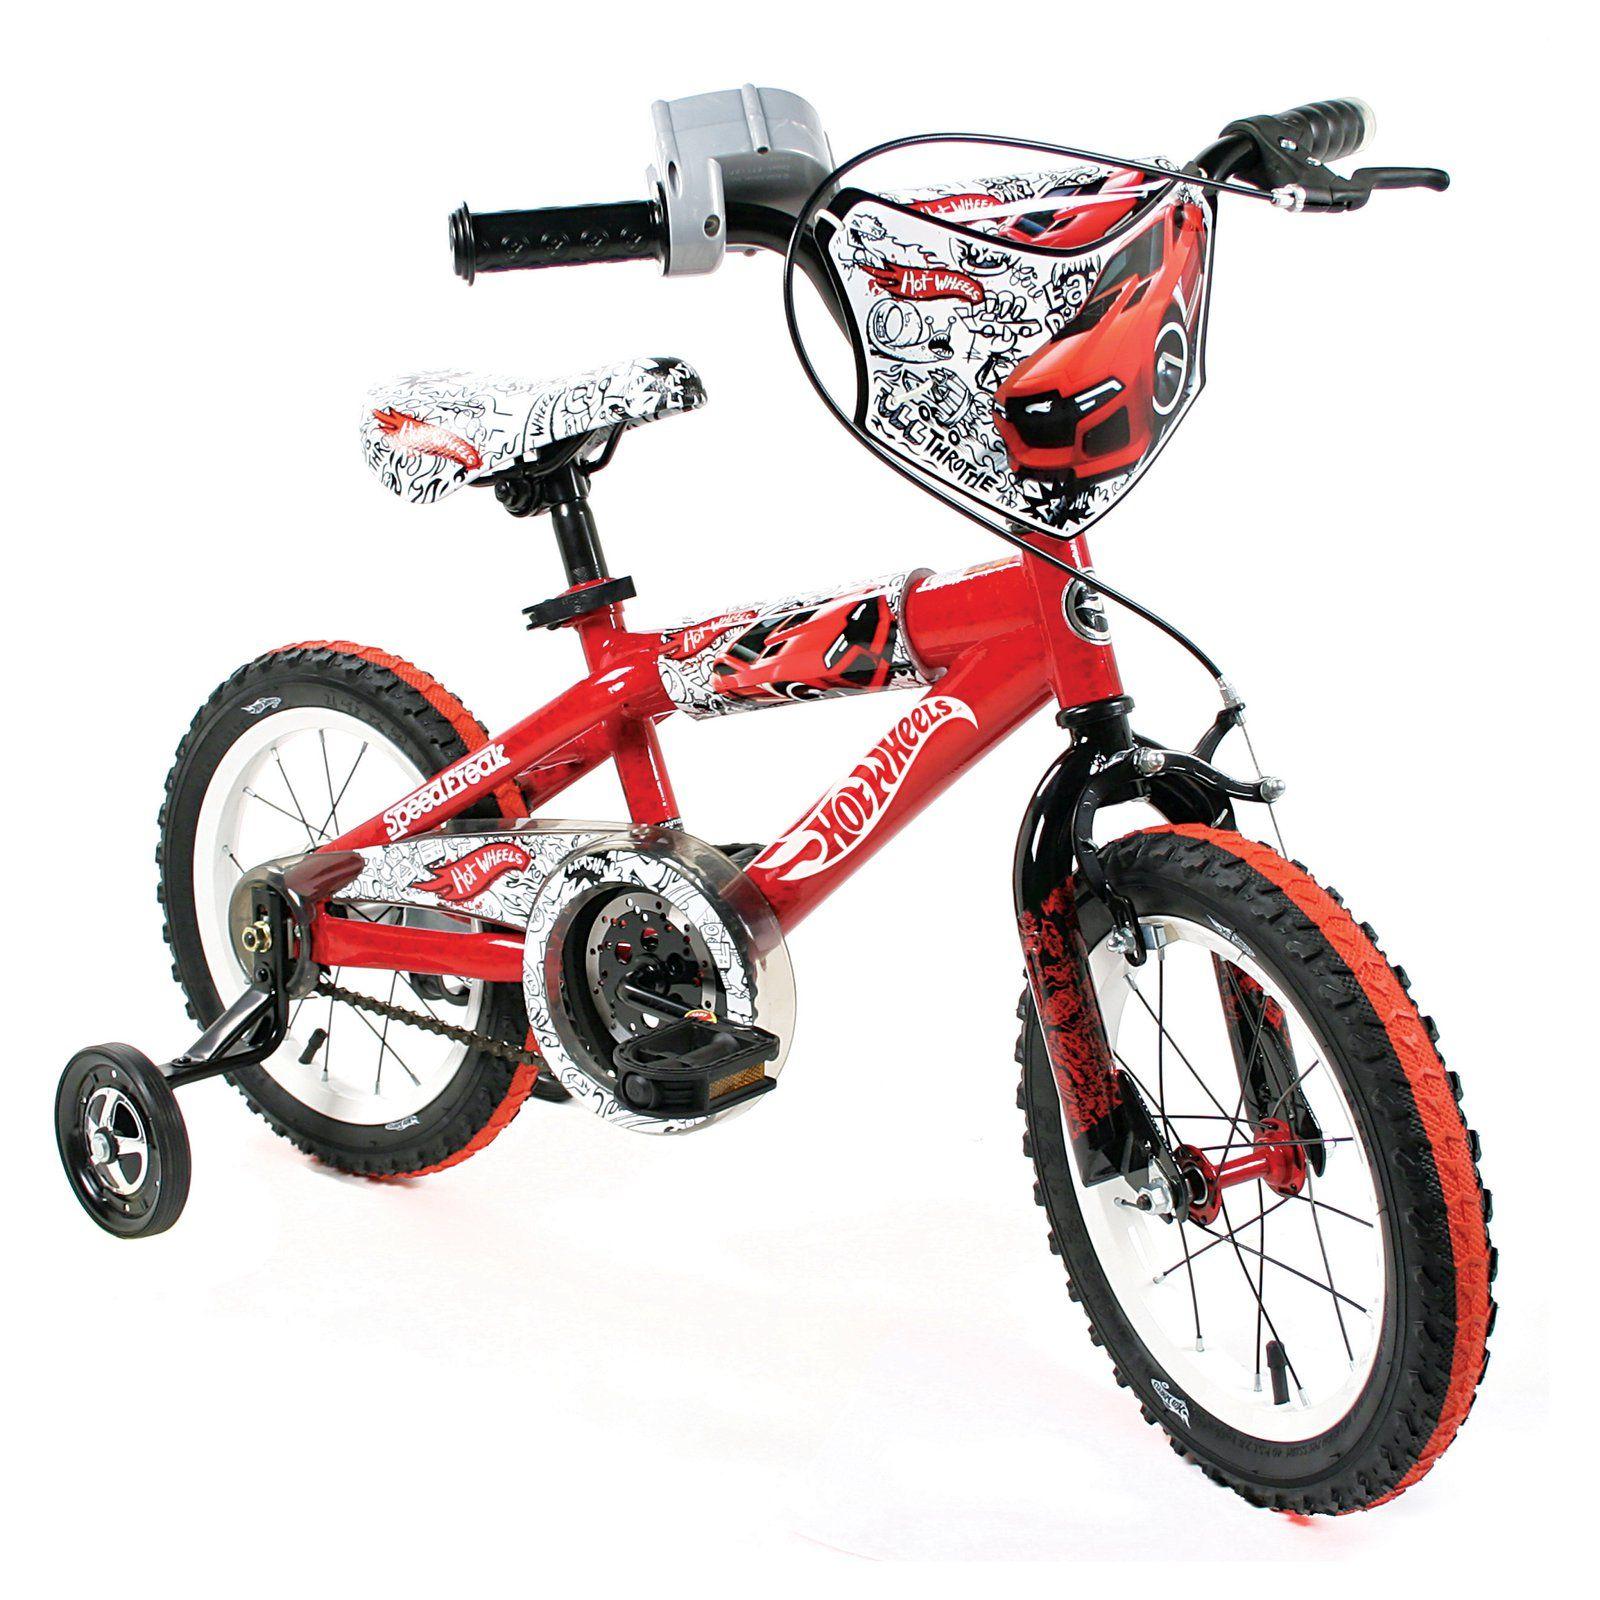 Hot Wheels Boy S 16 Inch Bike Black Red Orange From 4 5 6 And 7